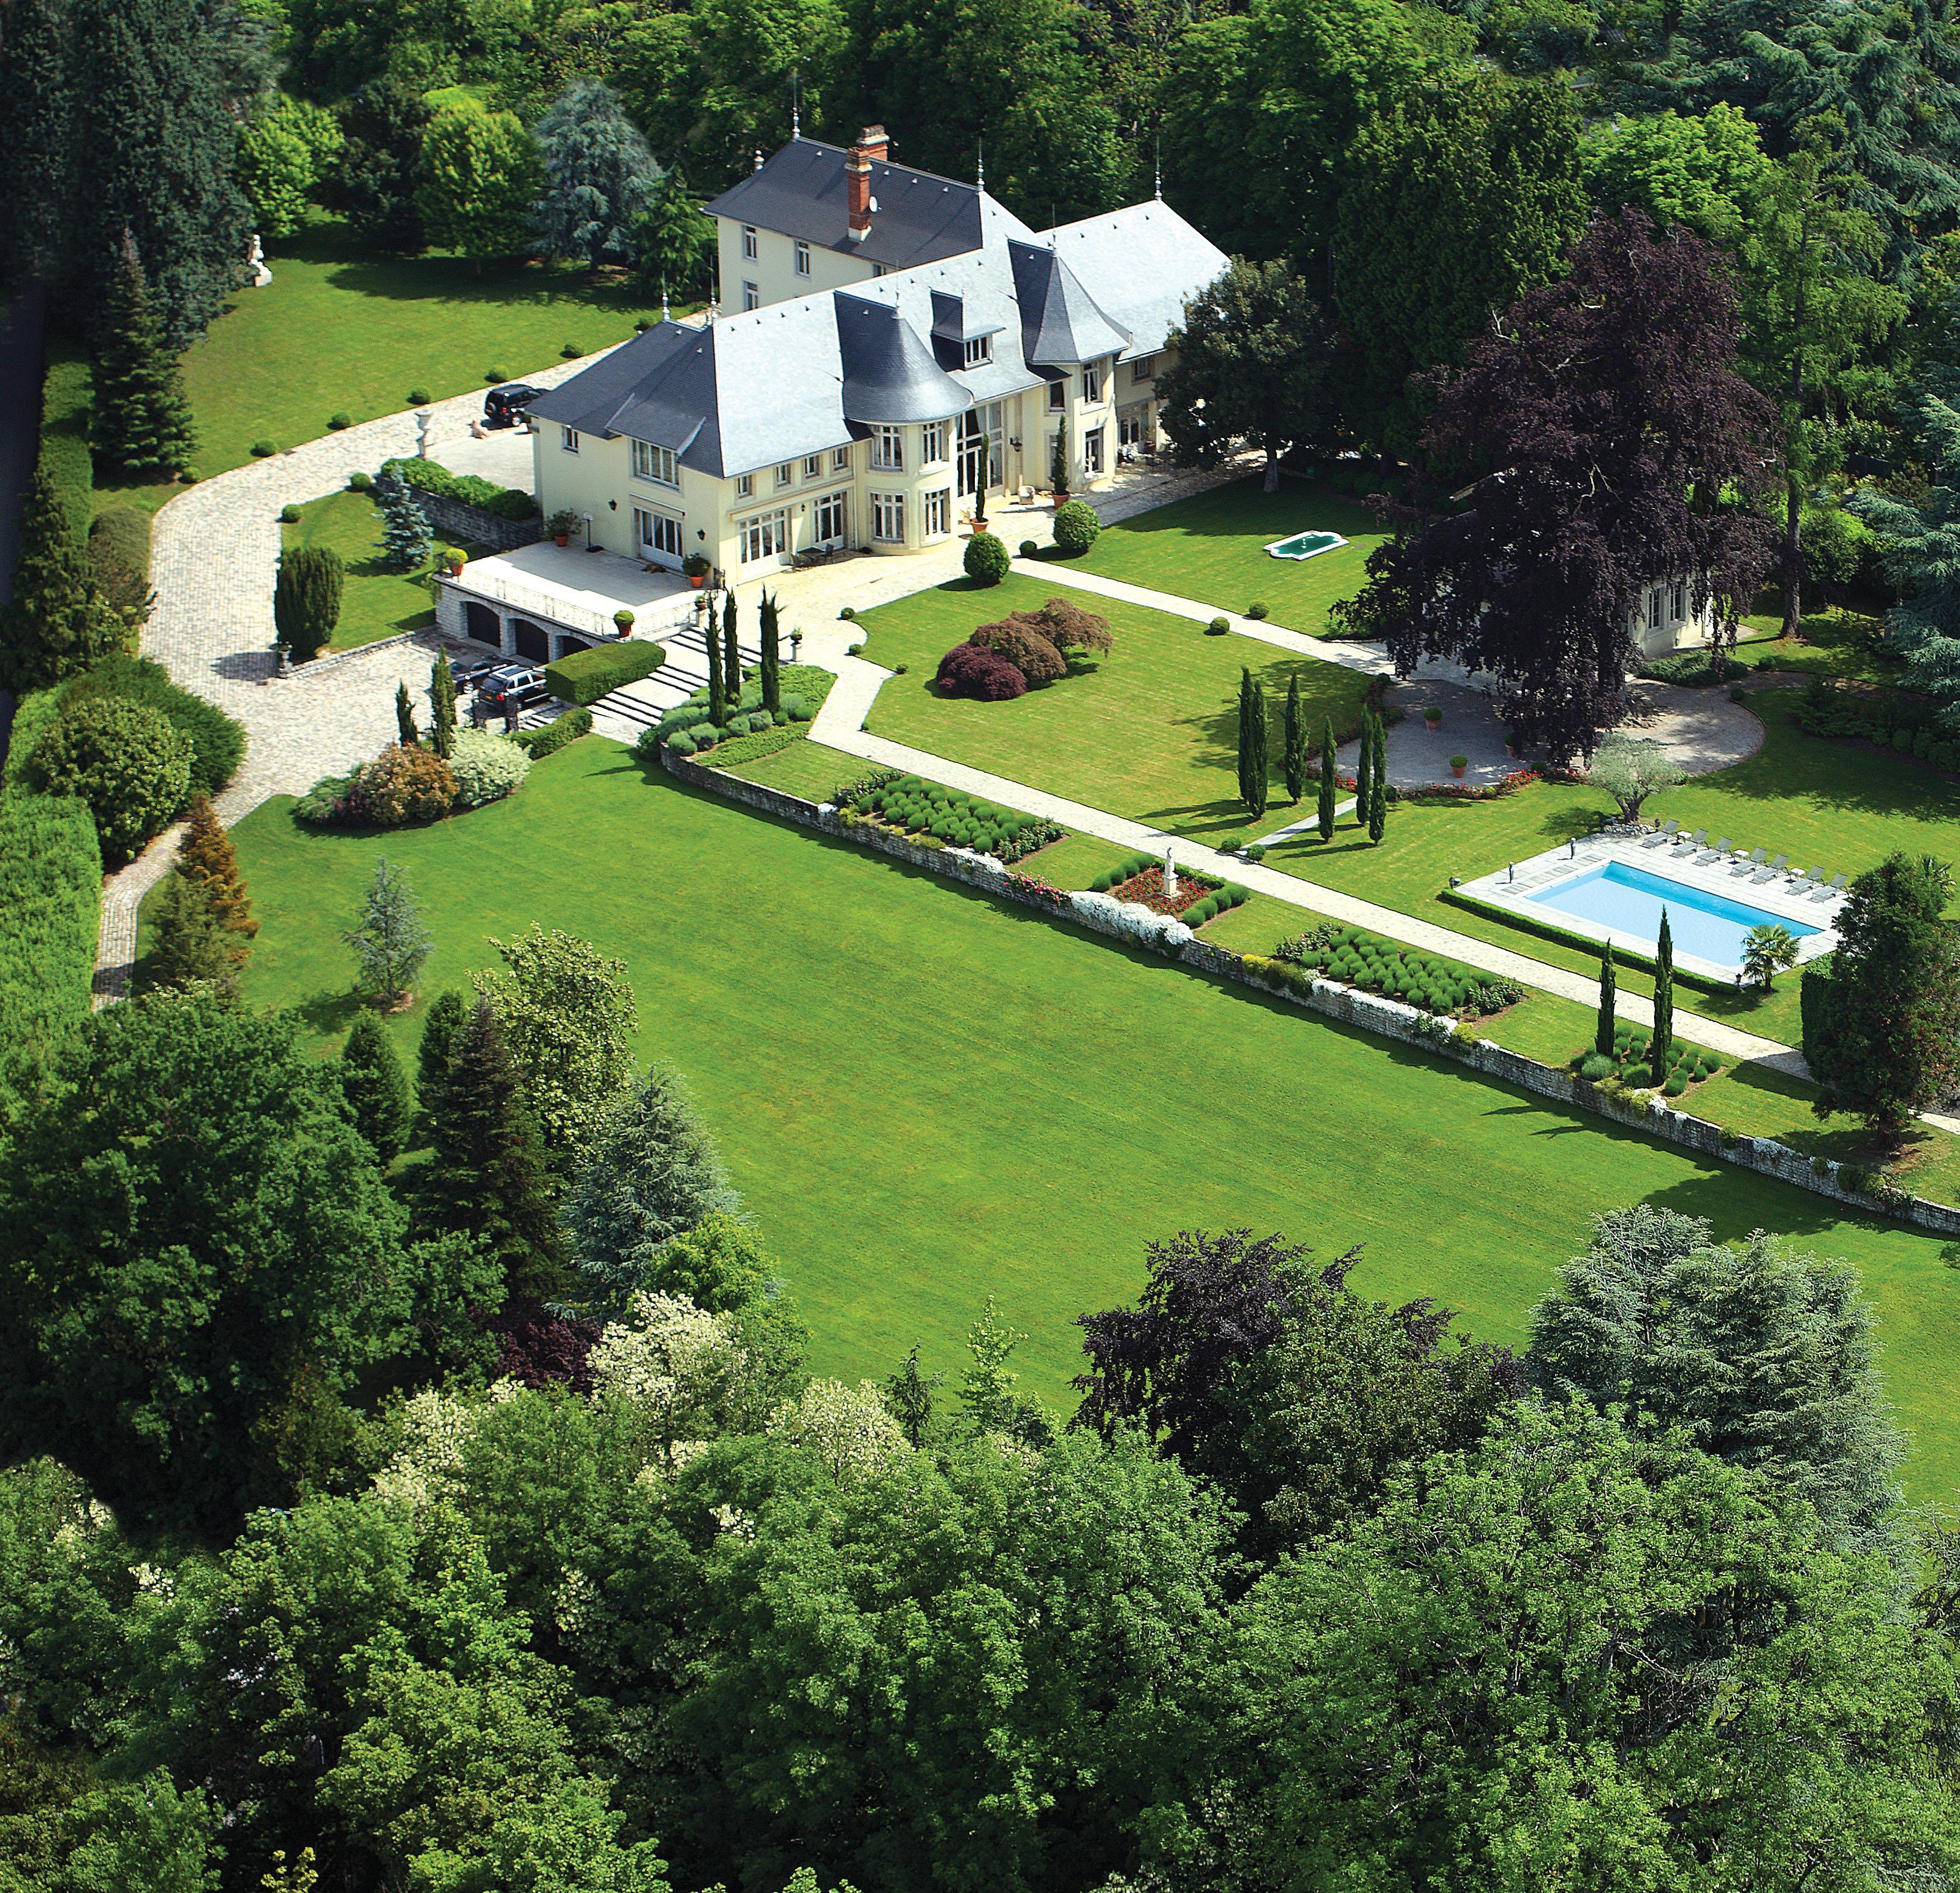 Частный односемейный дом для того Продажа на Somptueuse demeure dominant le lac du Bourget Other Rhone-Alpes, Рона-Альпы 73100 Франция